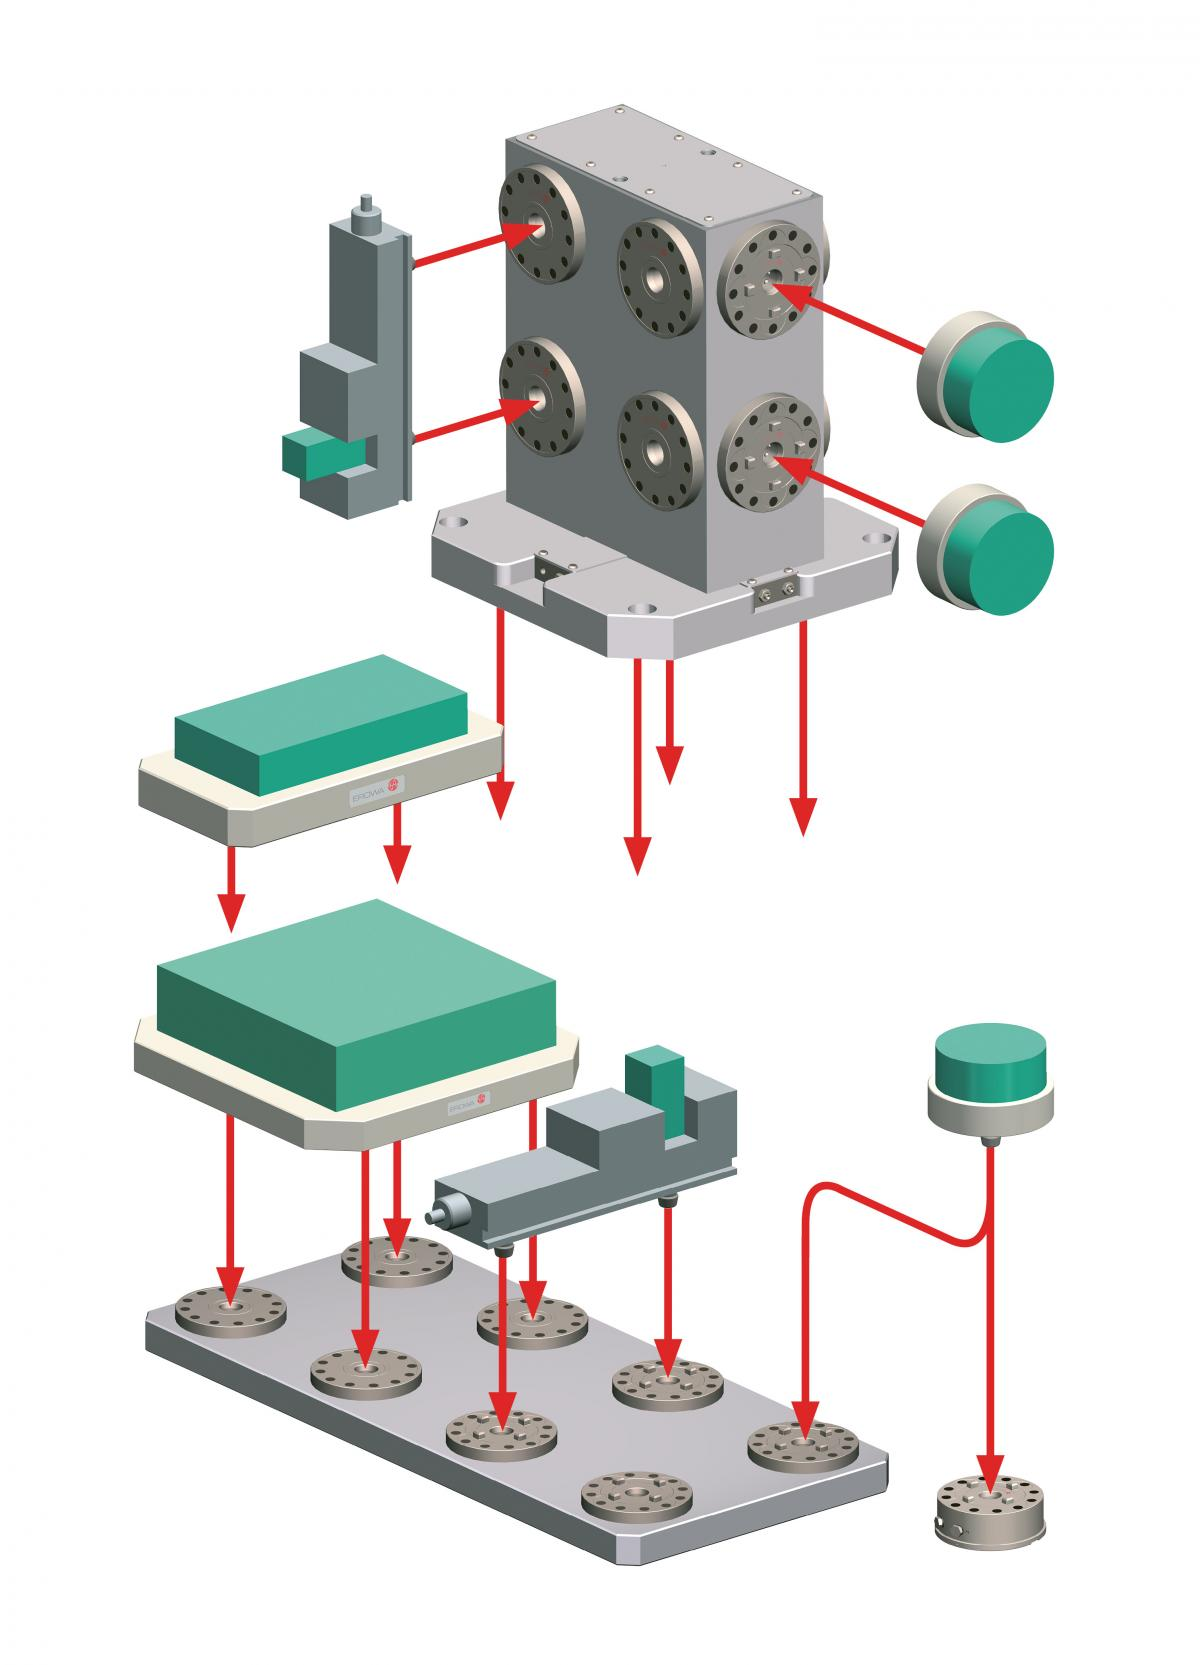 Berühmt Kabelverpresswerkzeug Ideen - Schaltplan Serie Circuit ...